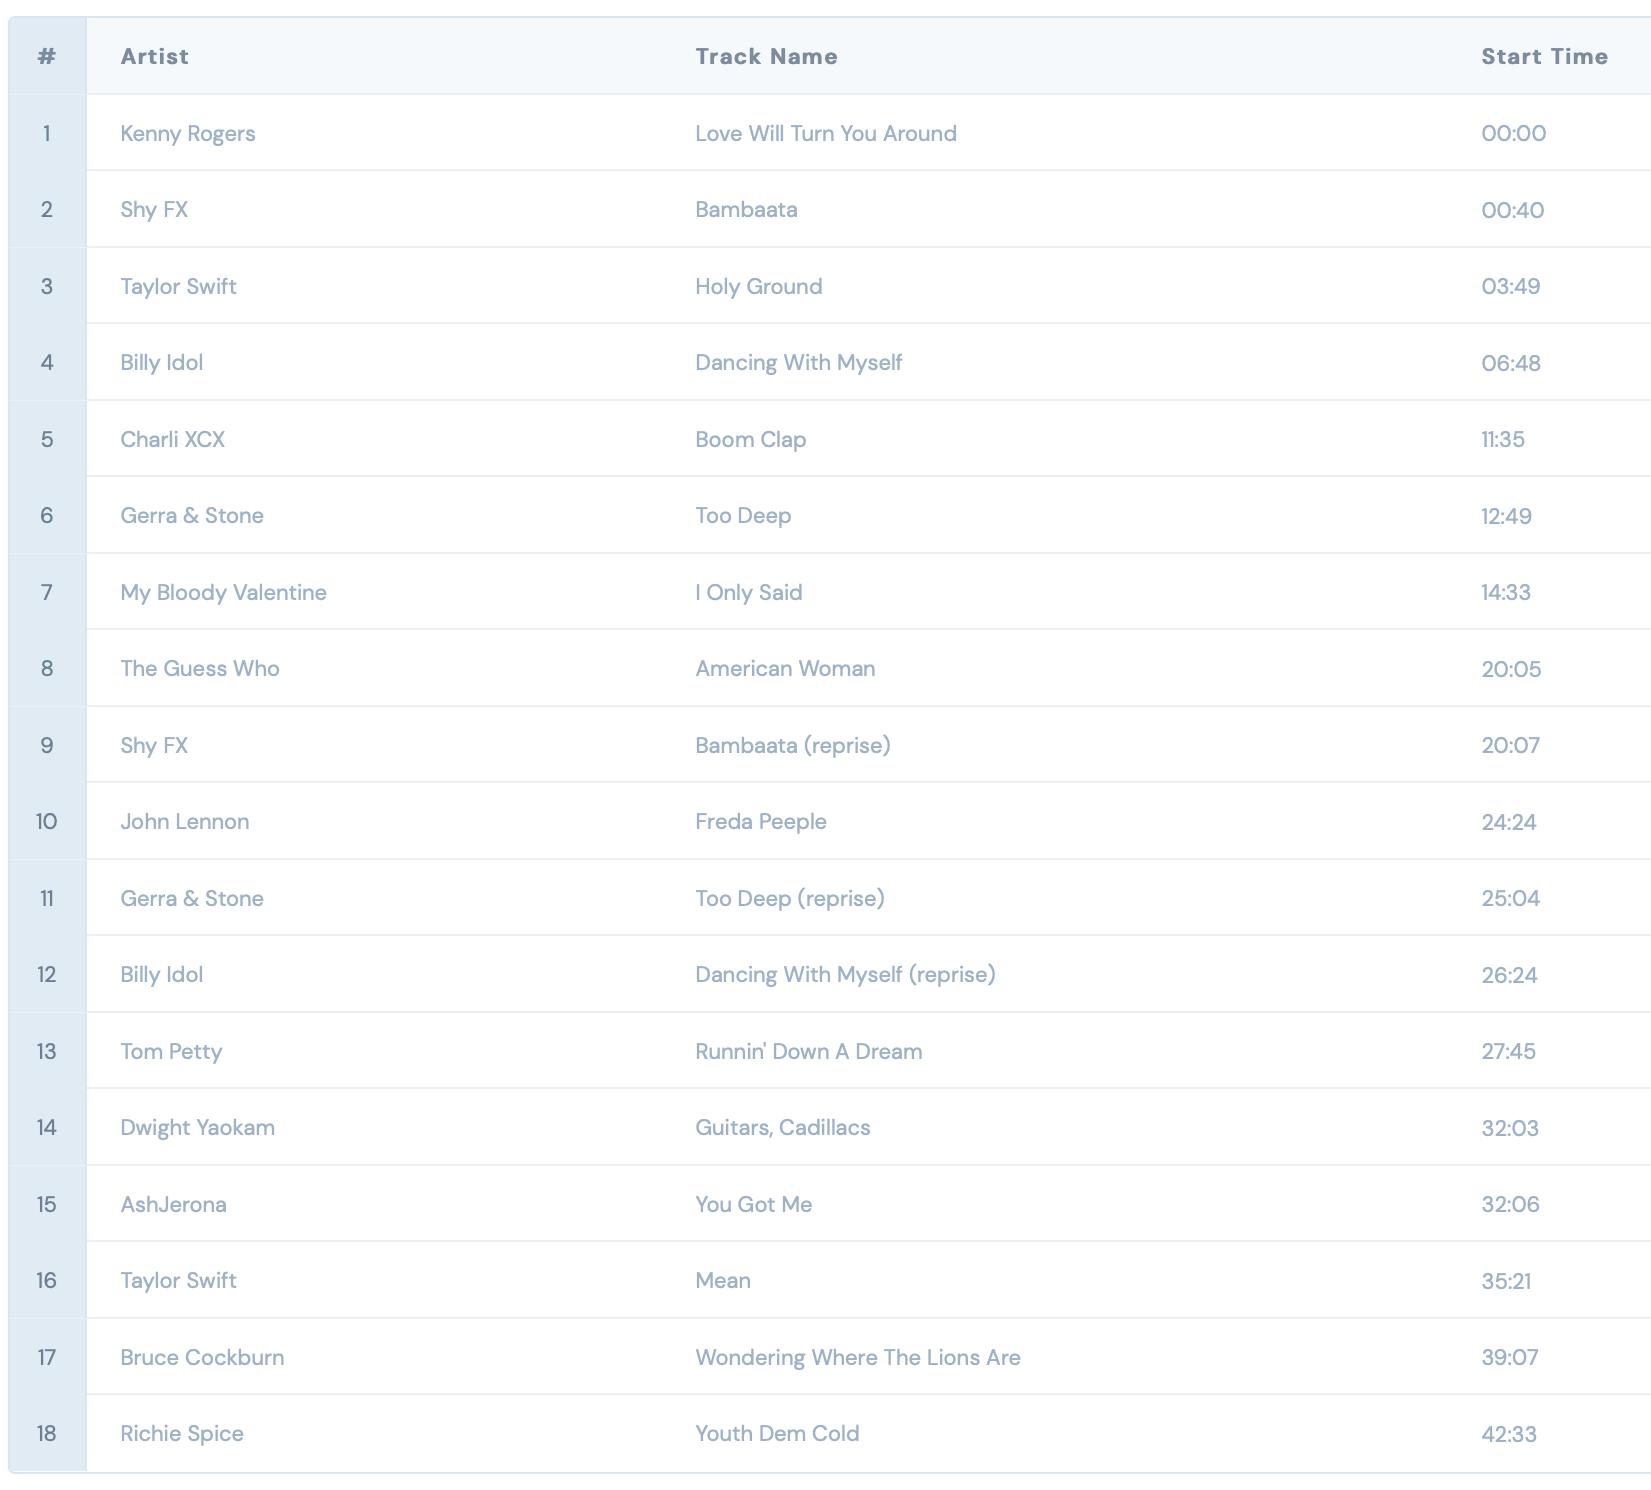 Dr Teeth's Drum & Bass Country DJ mix tracklist